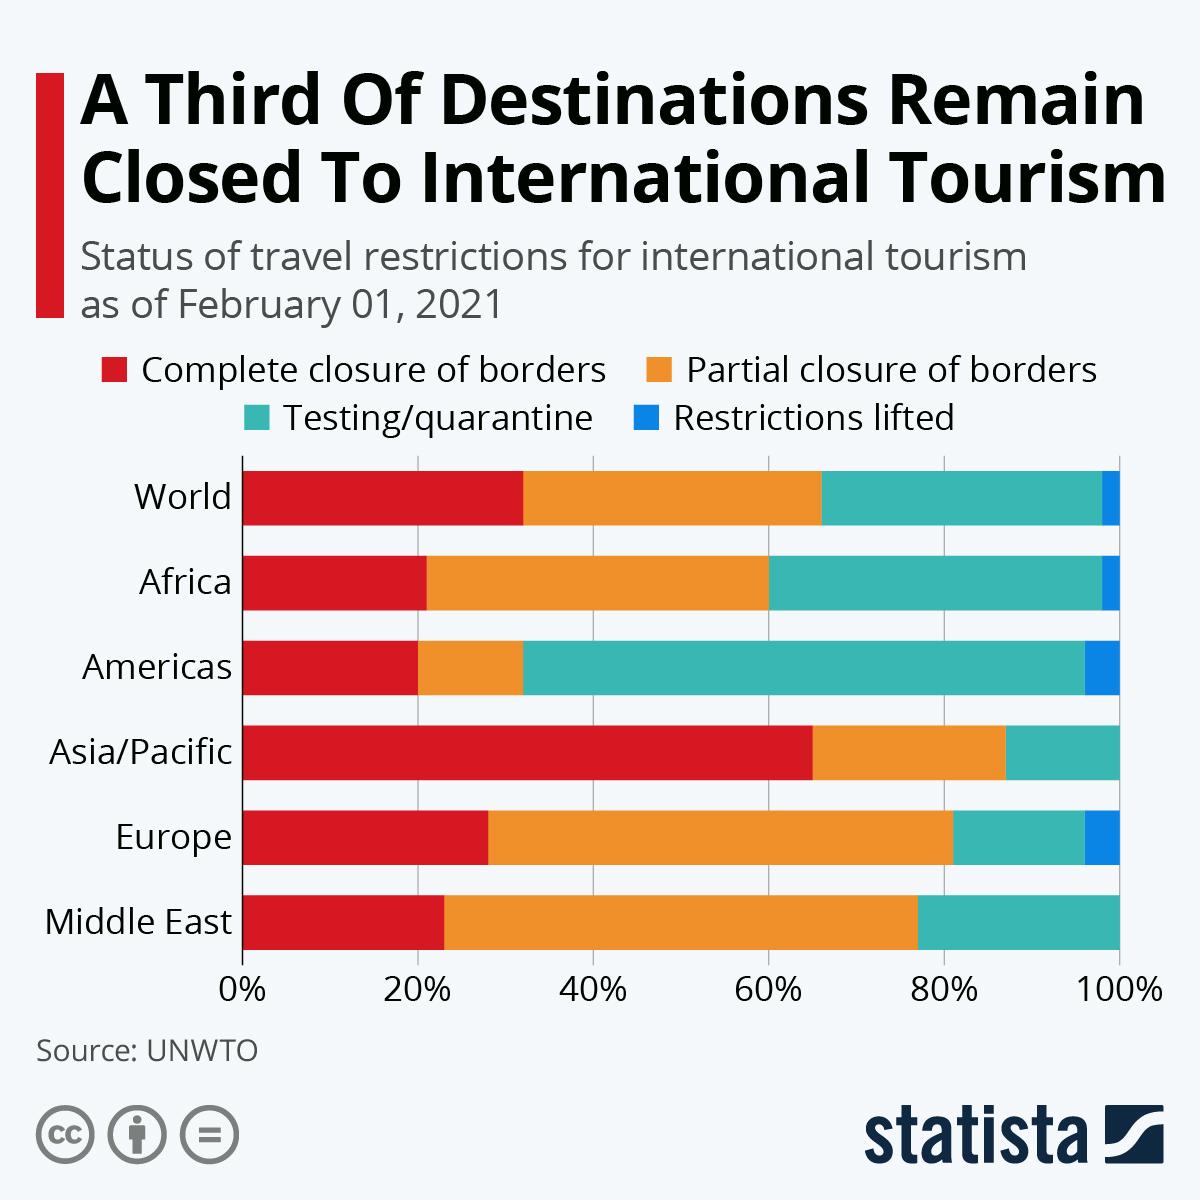 A Third of Destinations Remain Closed To International Tourism